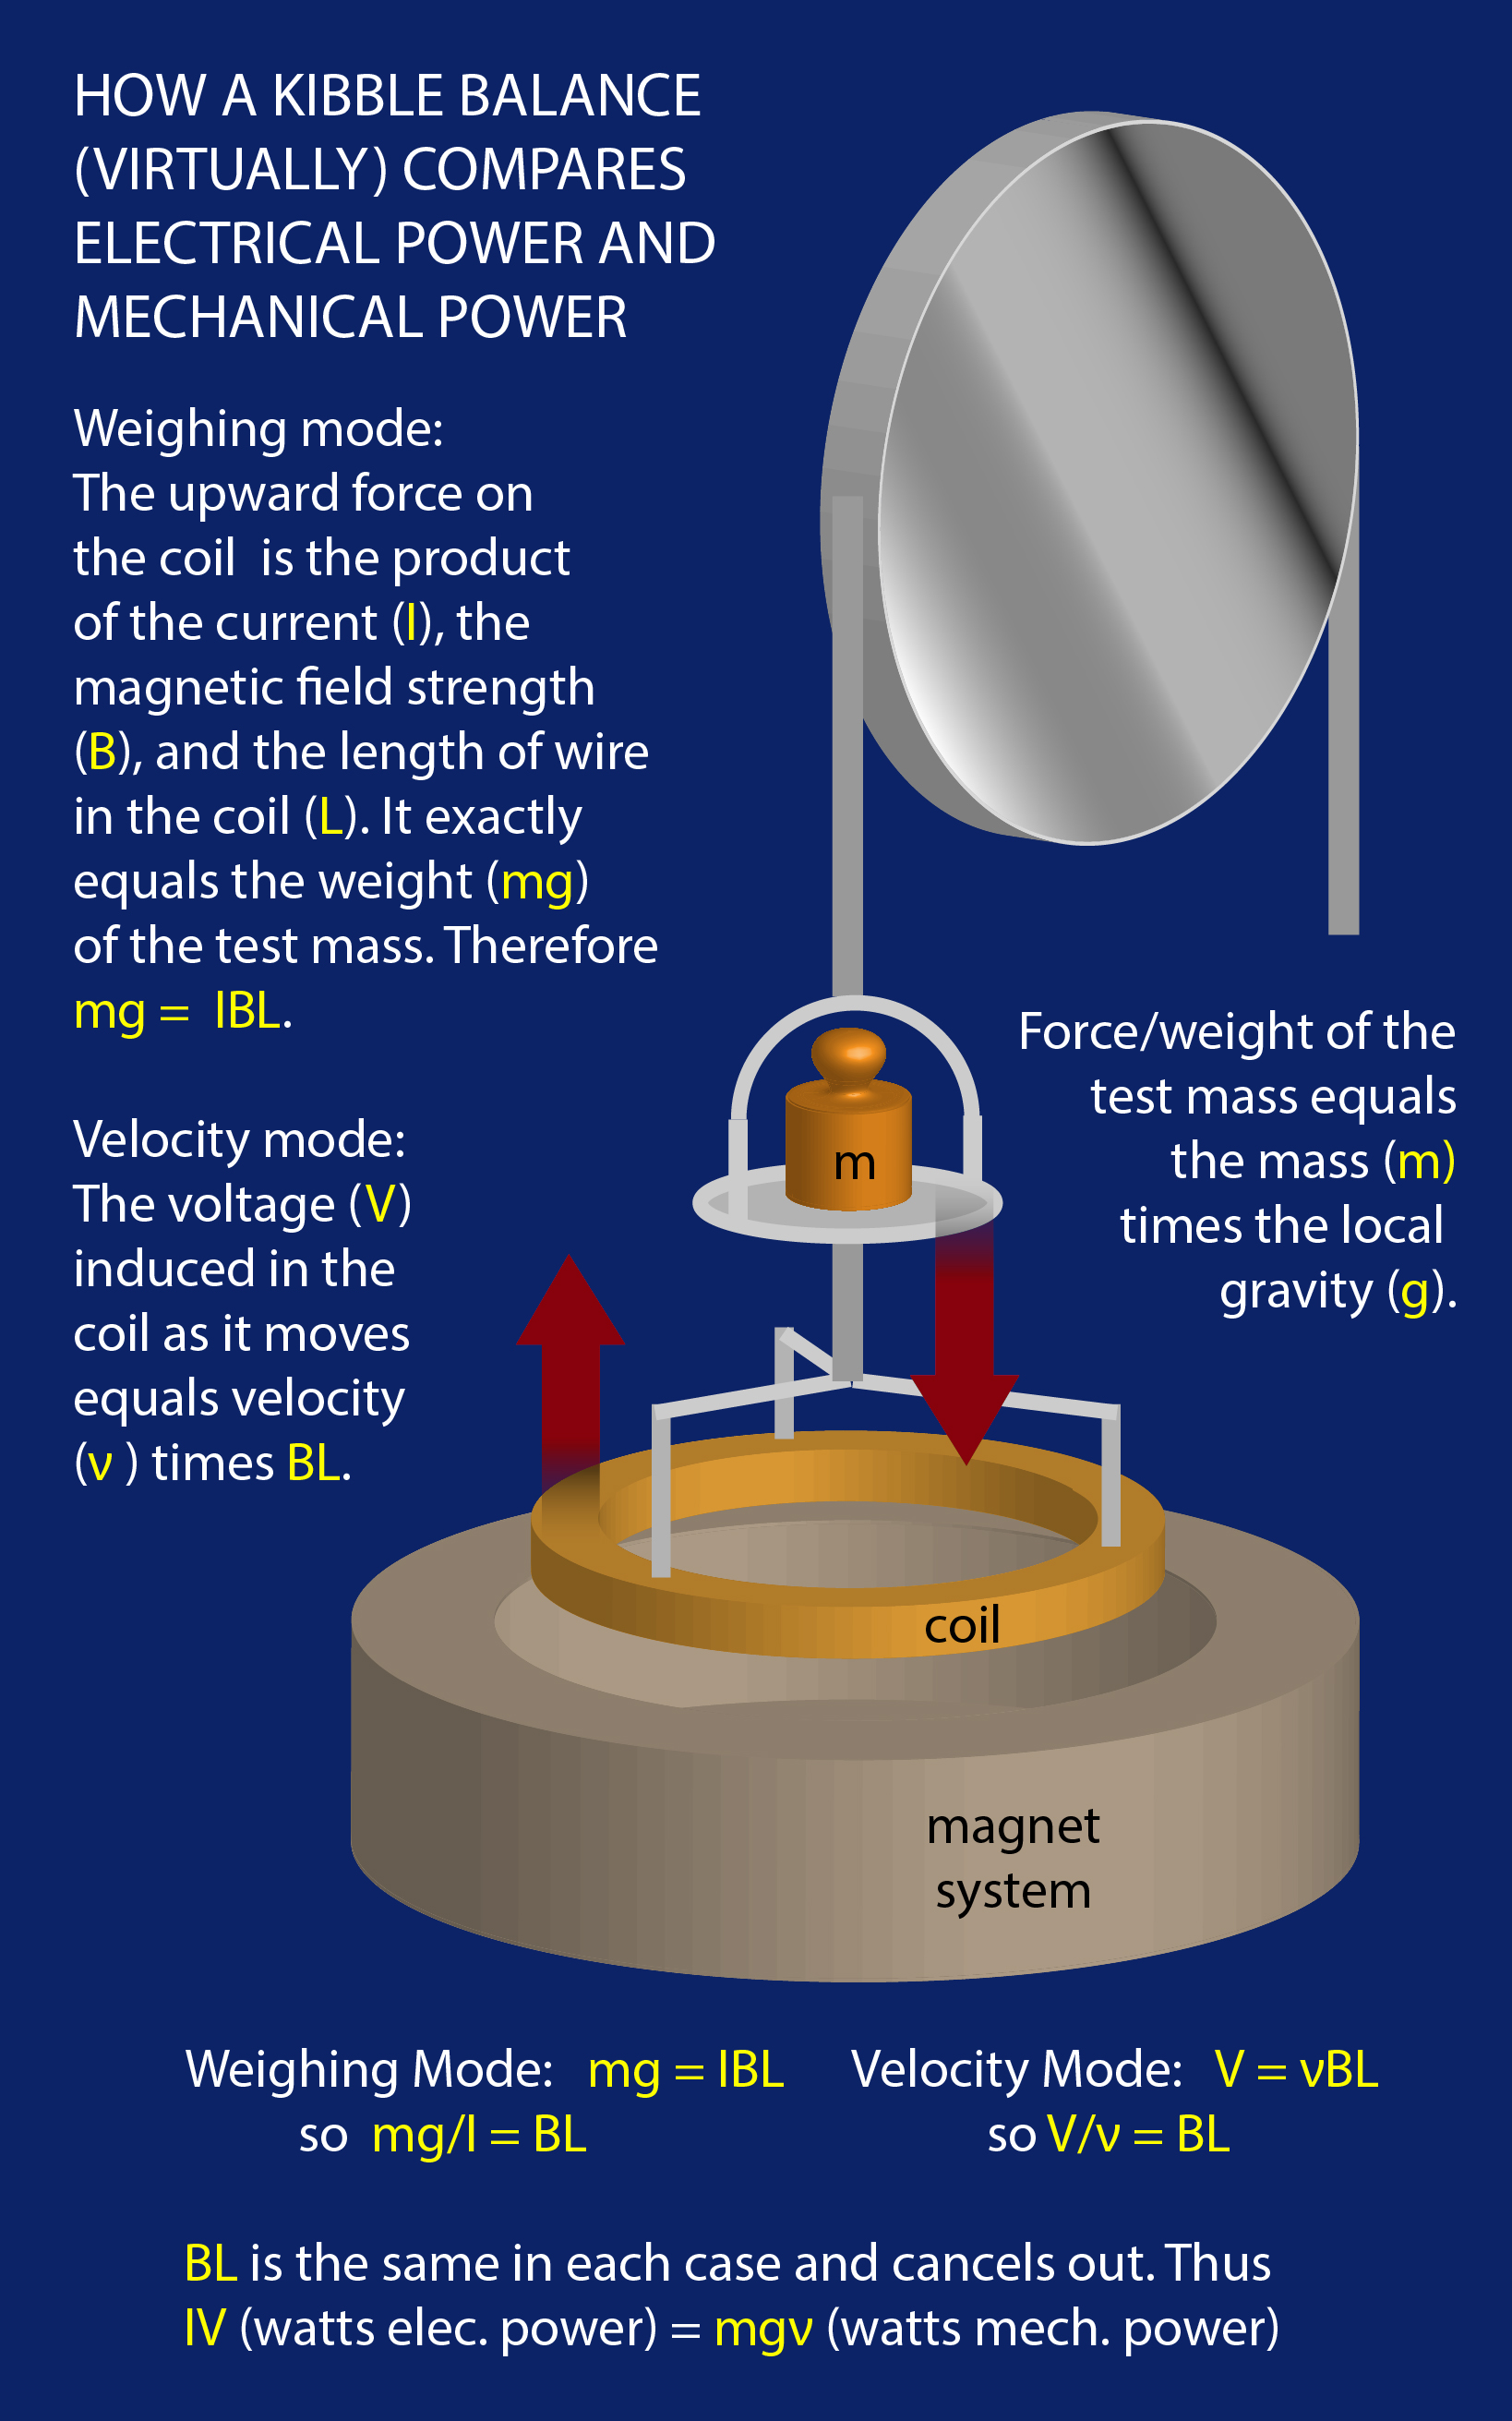 Kilogram: The Kibble Balance | NIST